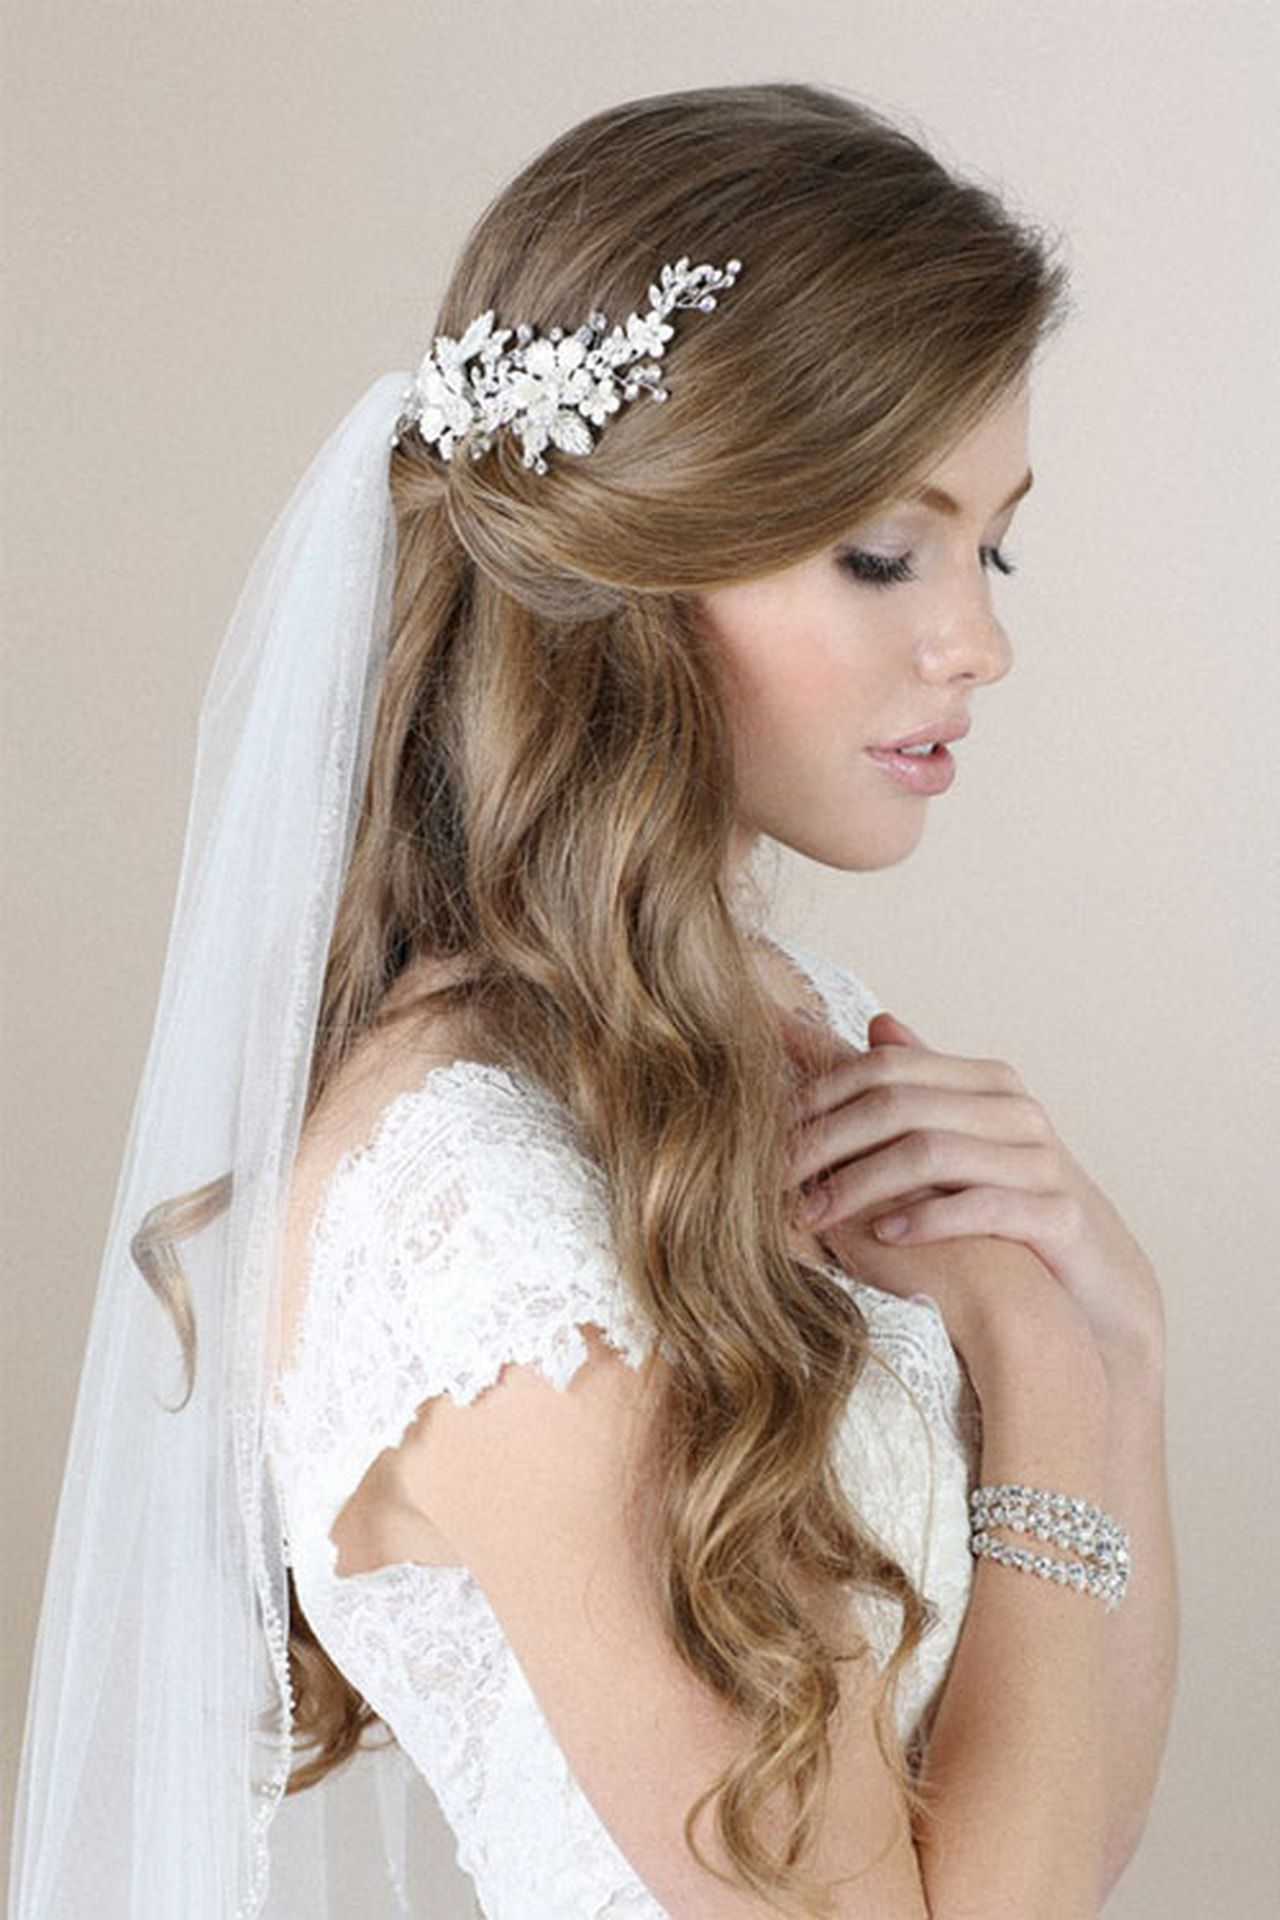 بالصور رمزيات عروس , رمزيات عروس كيوت جديده 3642 13